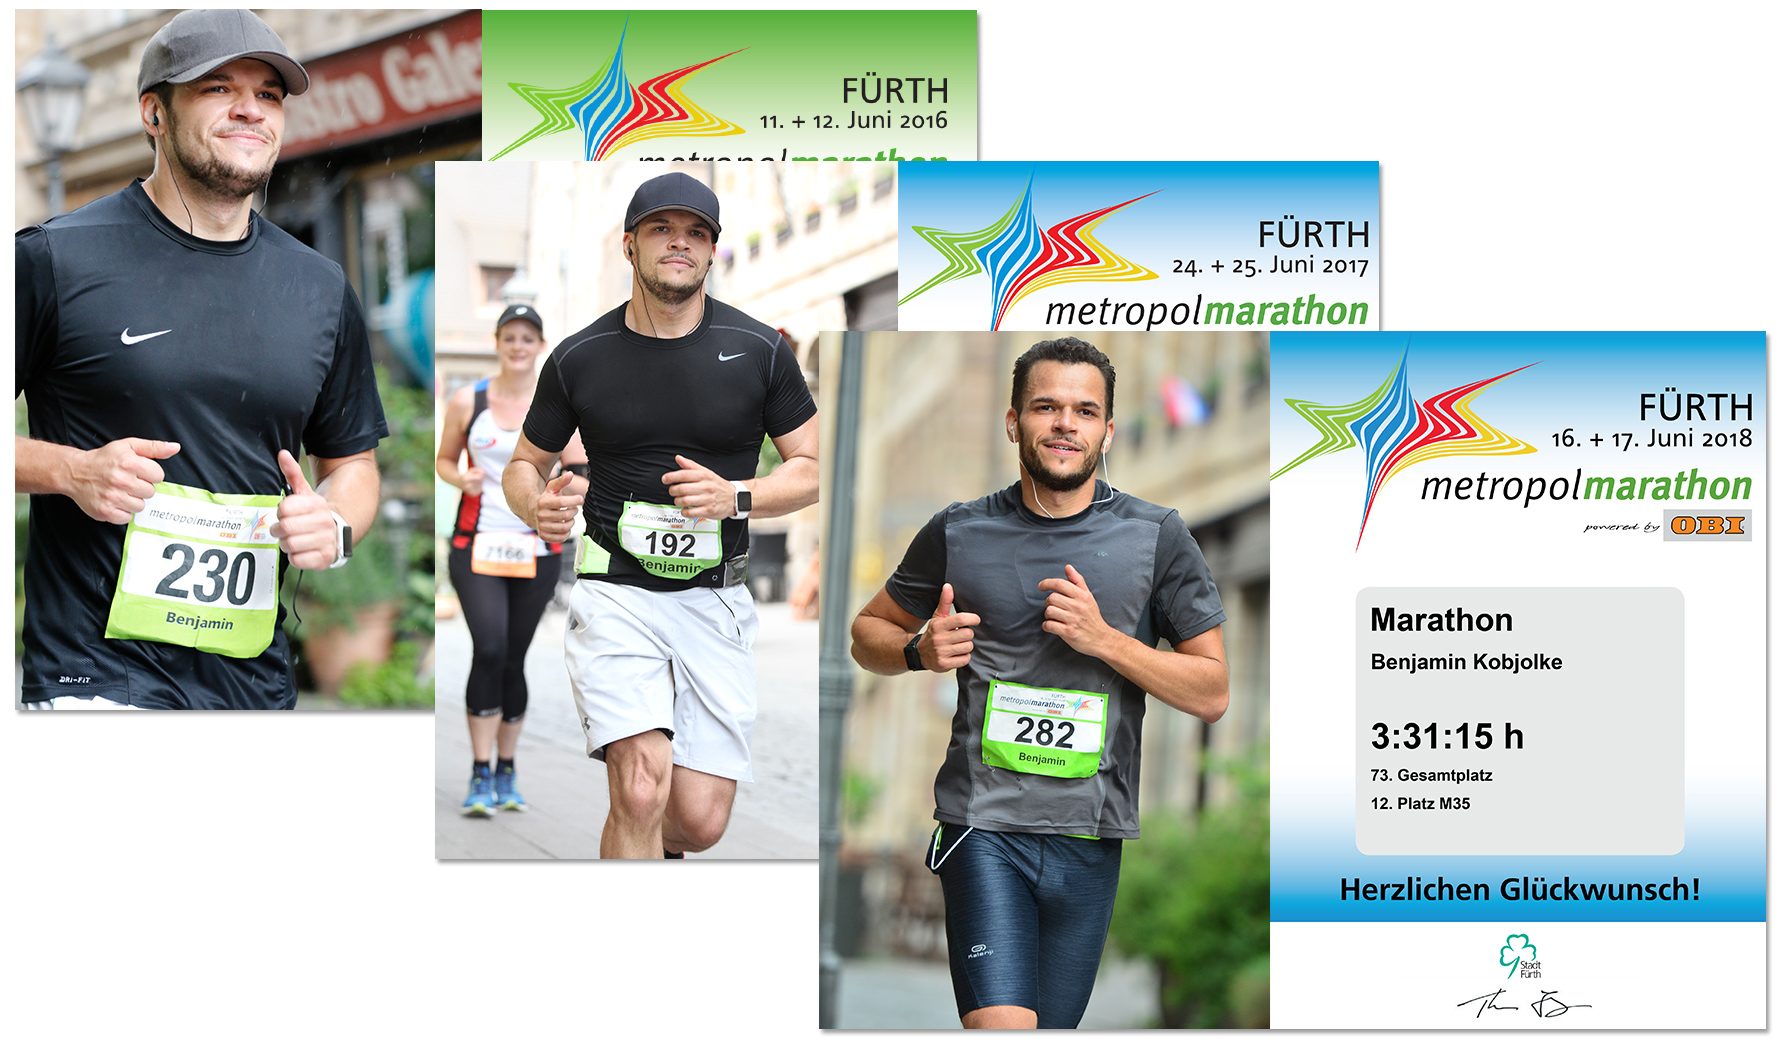 marathon_2016-2018